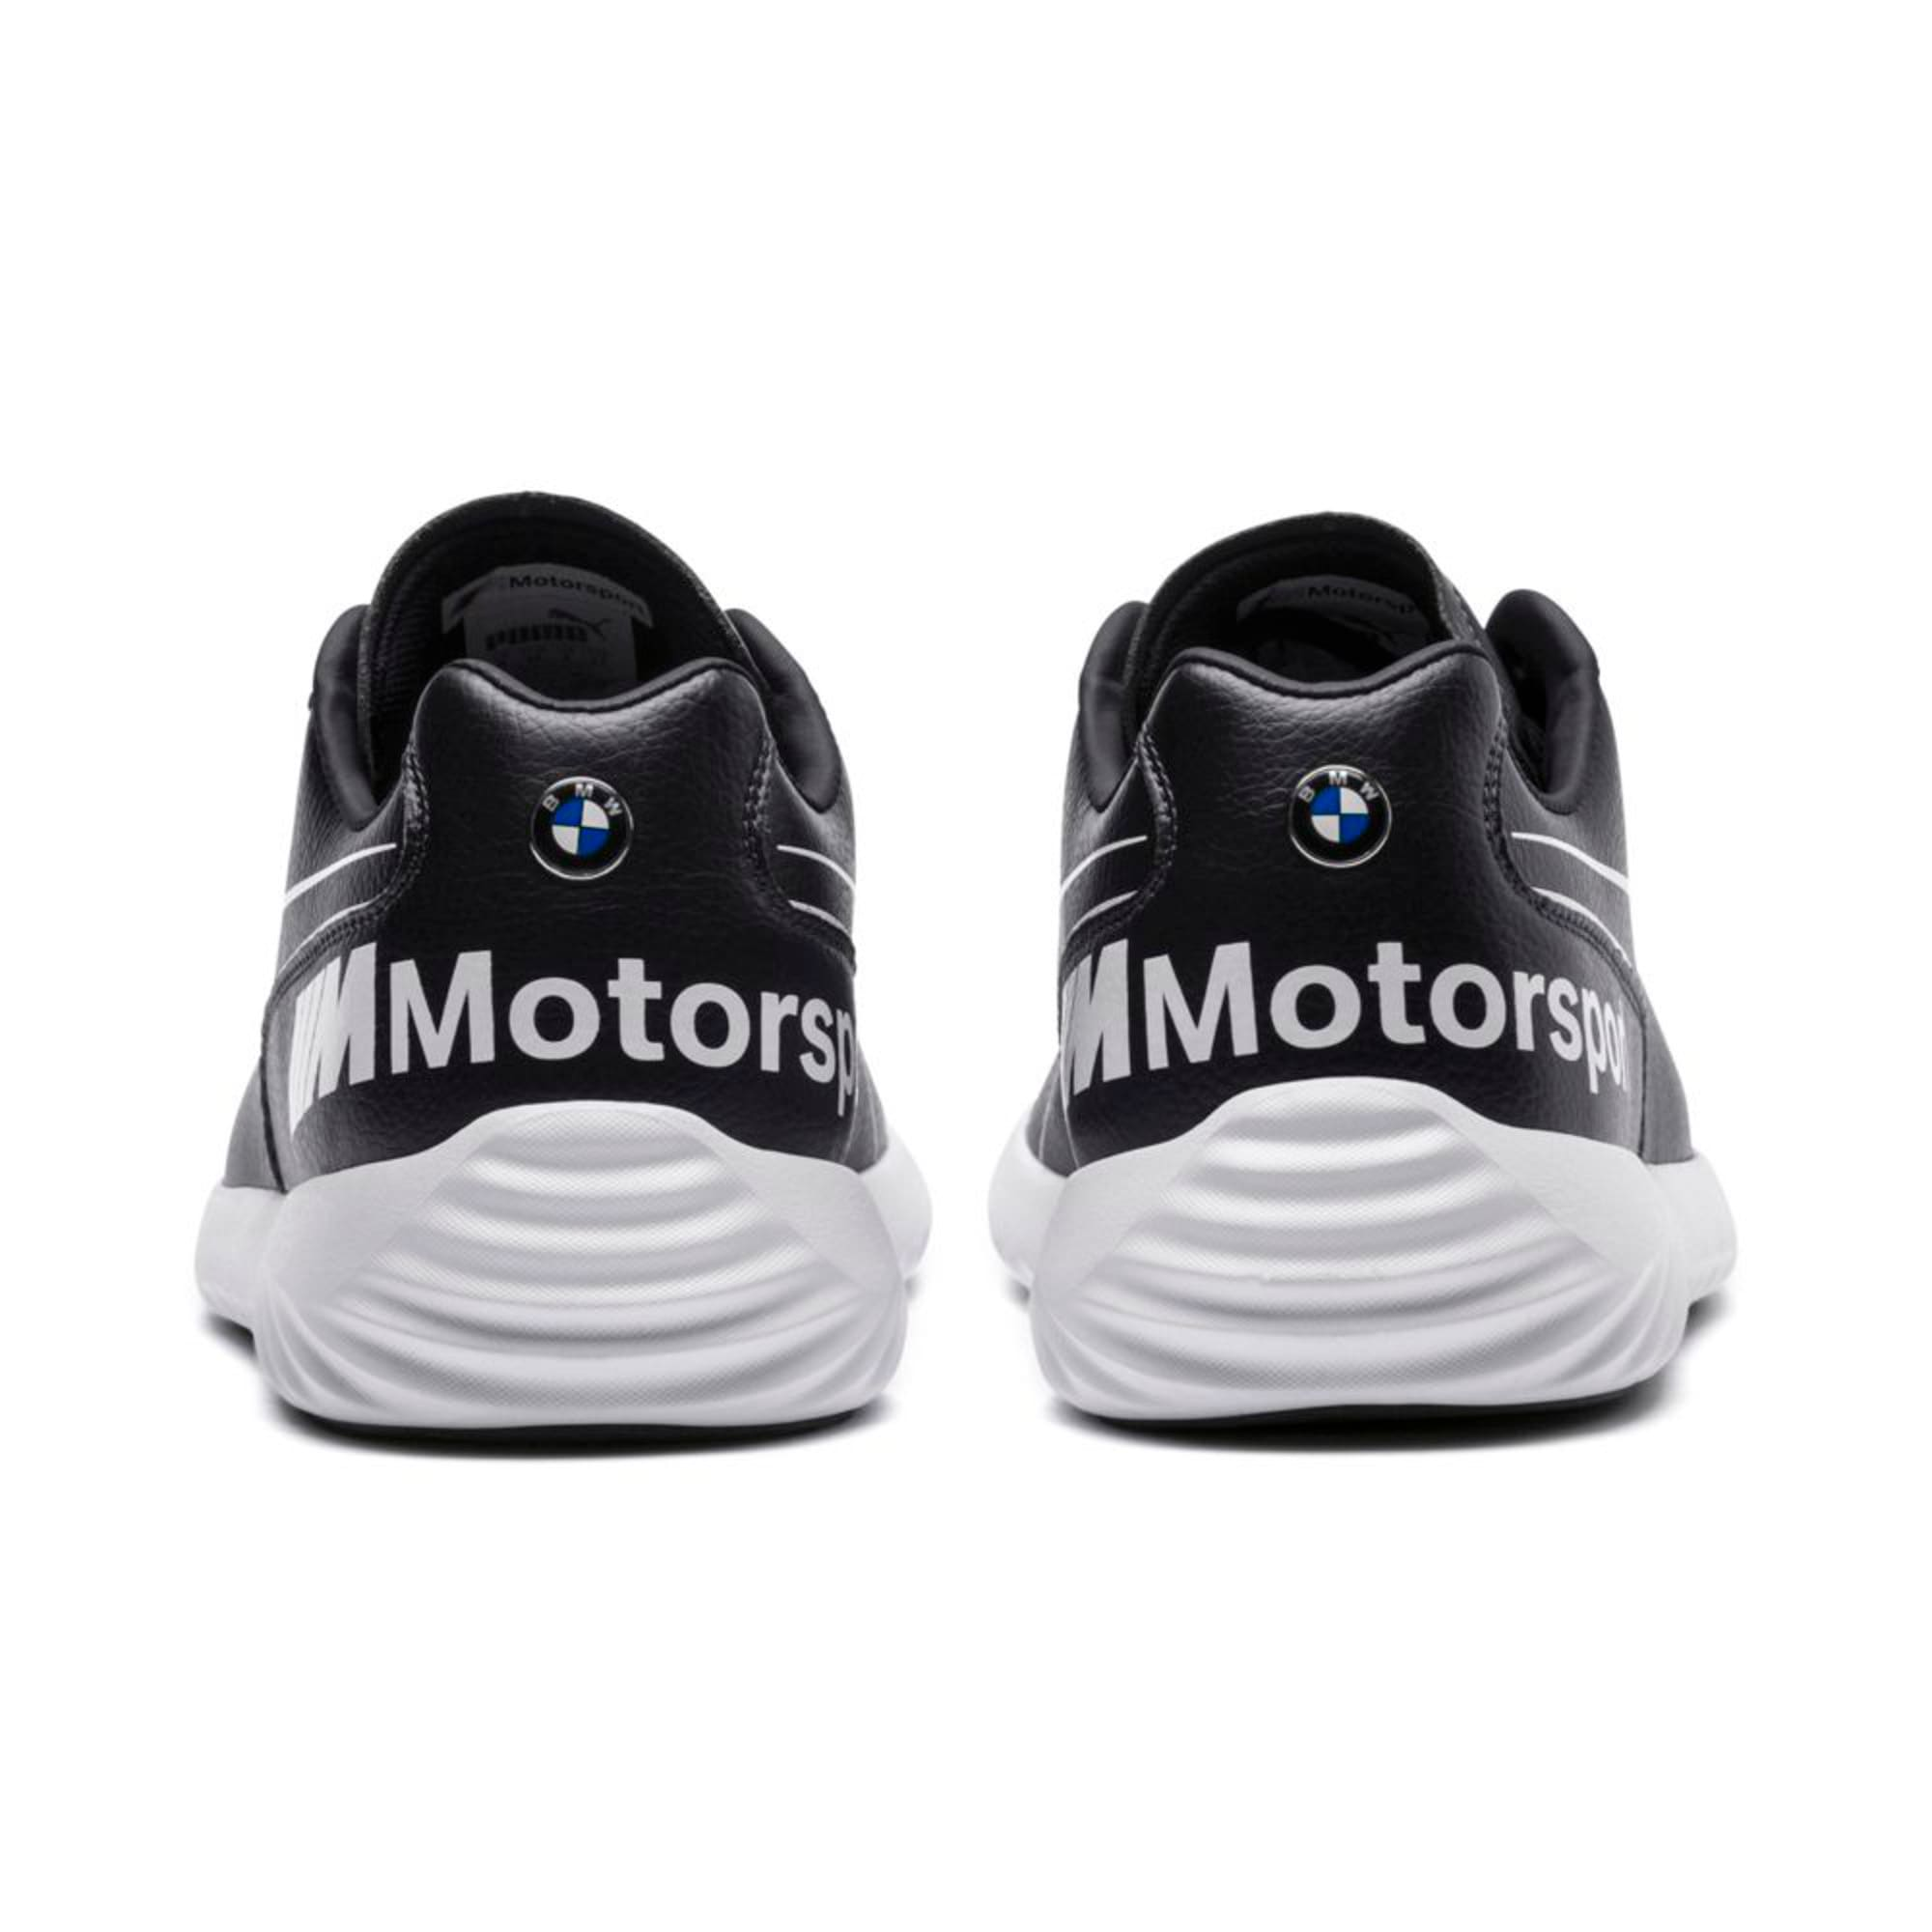 Thumbnail 4 of BMW M Motorsport SpeedCat Evo Synth Trainers, Anthracite-Puma White, medium-IND